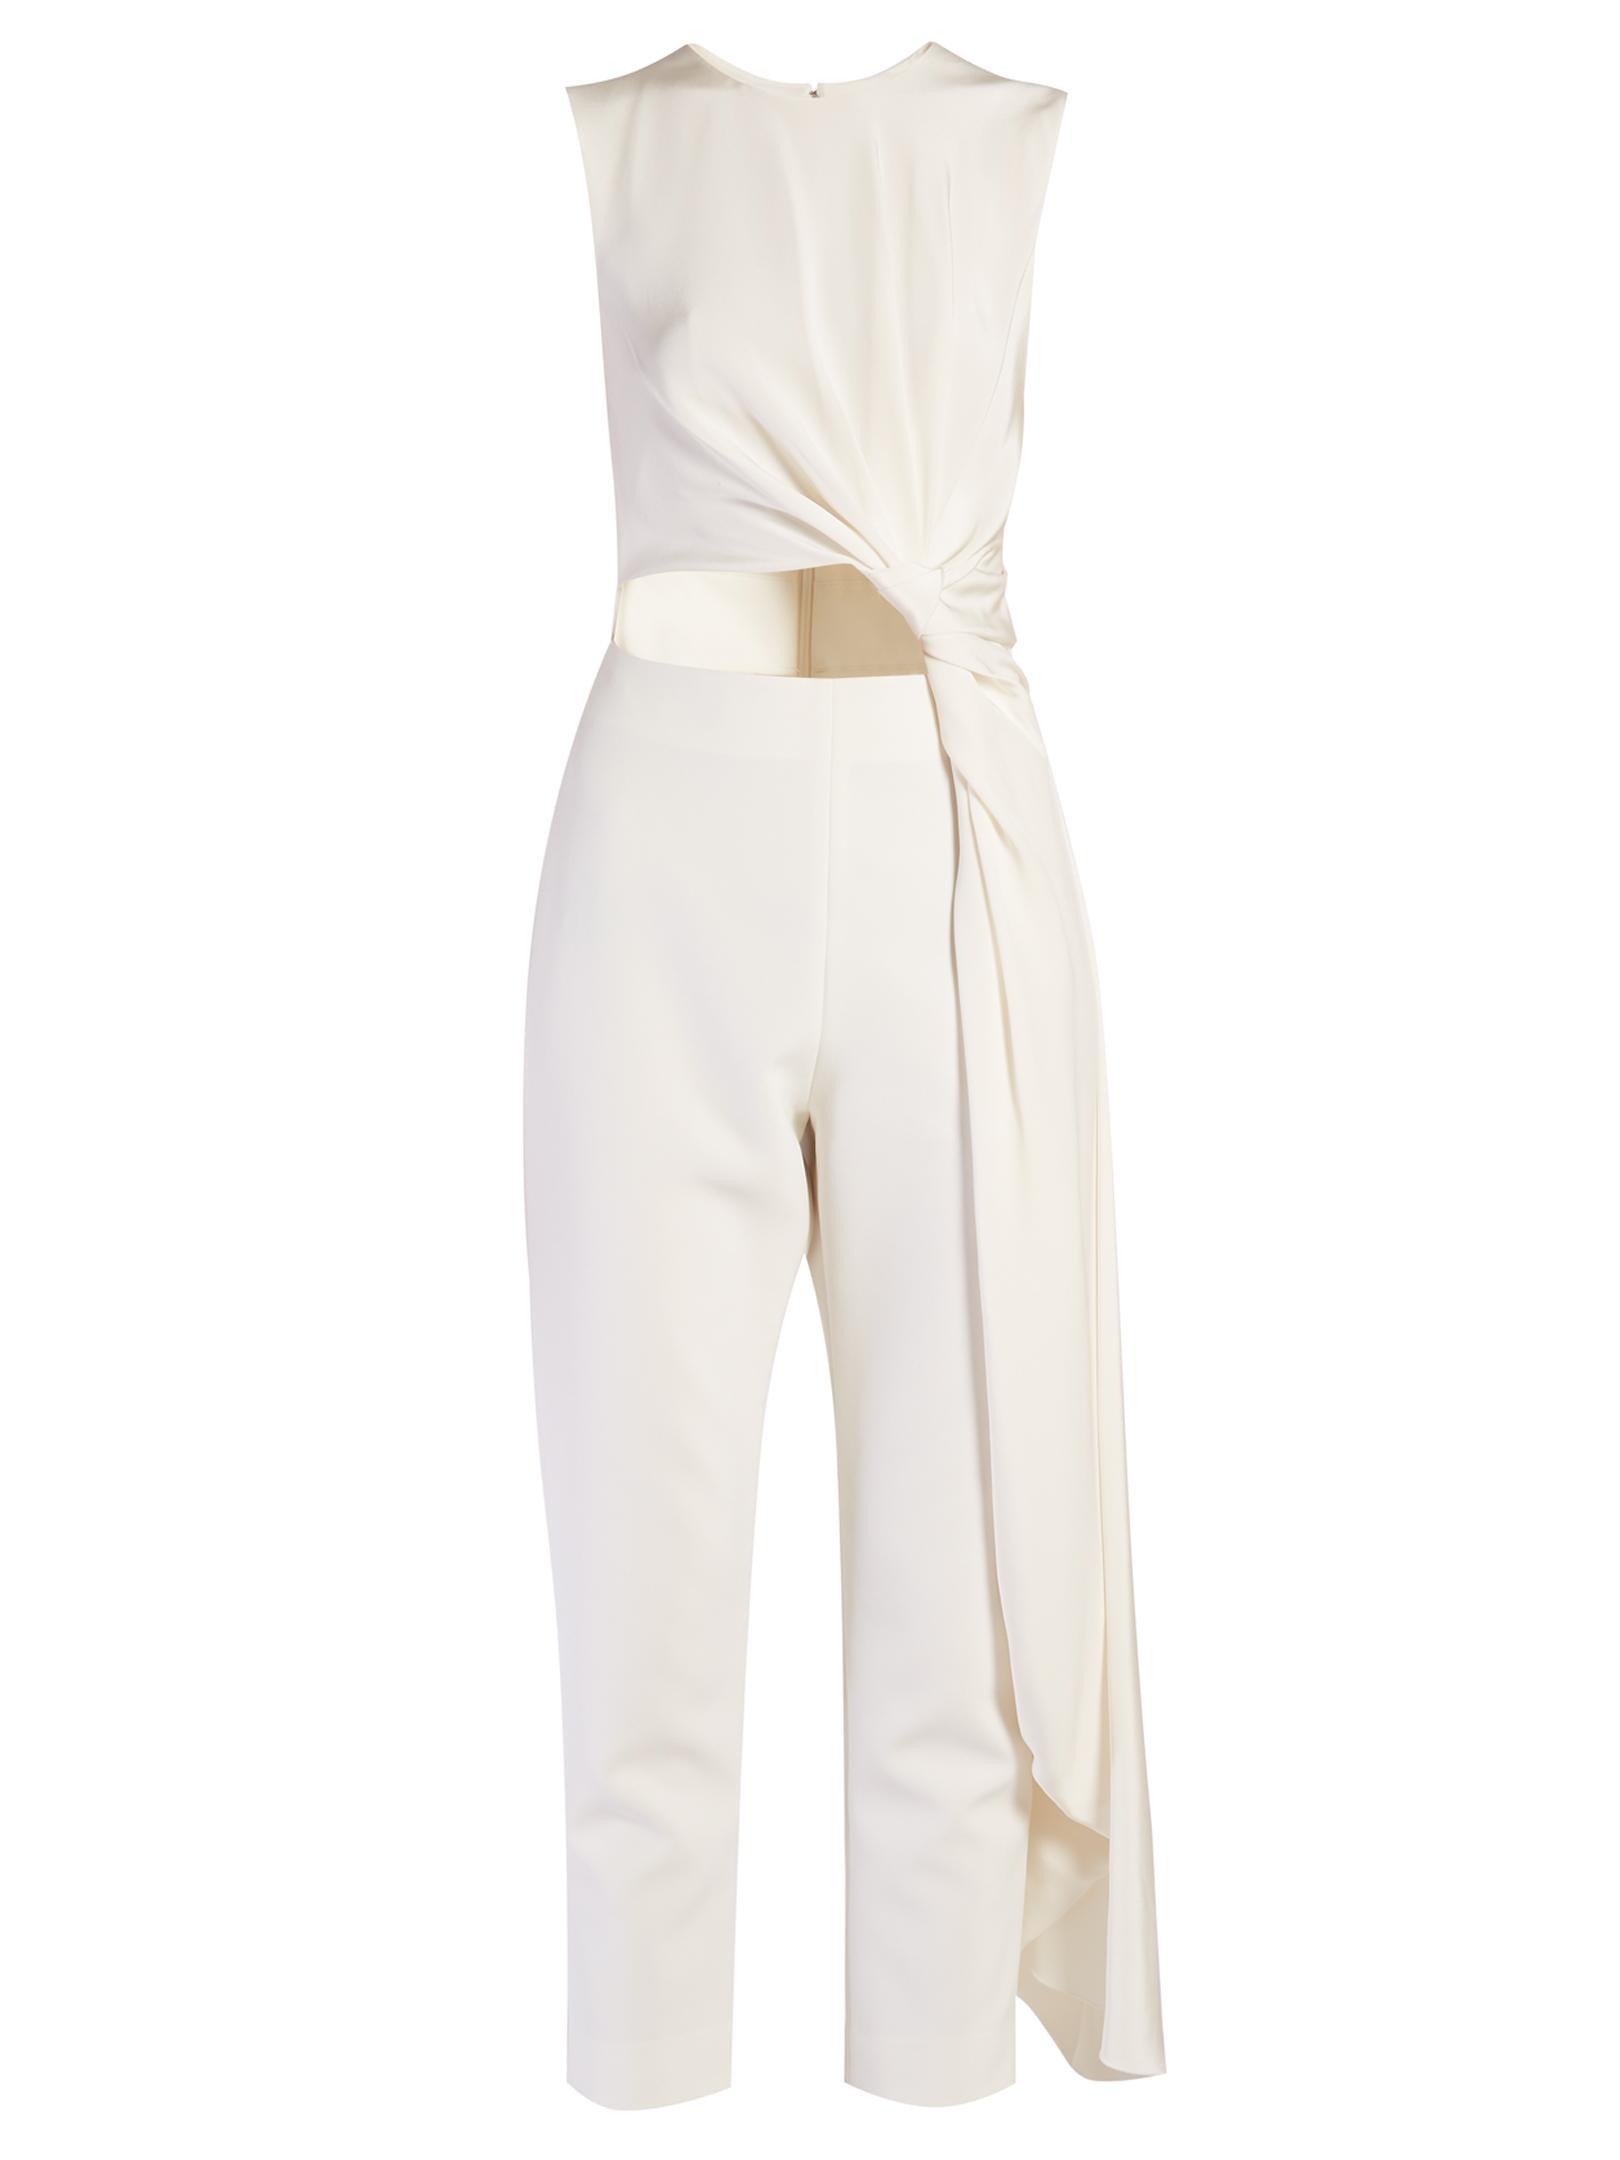 a2d5a4922f7 Lyst - ROKSANDA Thurloe Cut-out Knot-front Crepe Jumpsuit in White